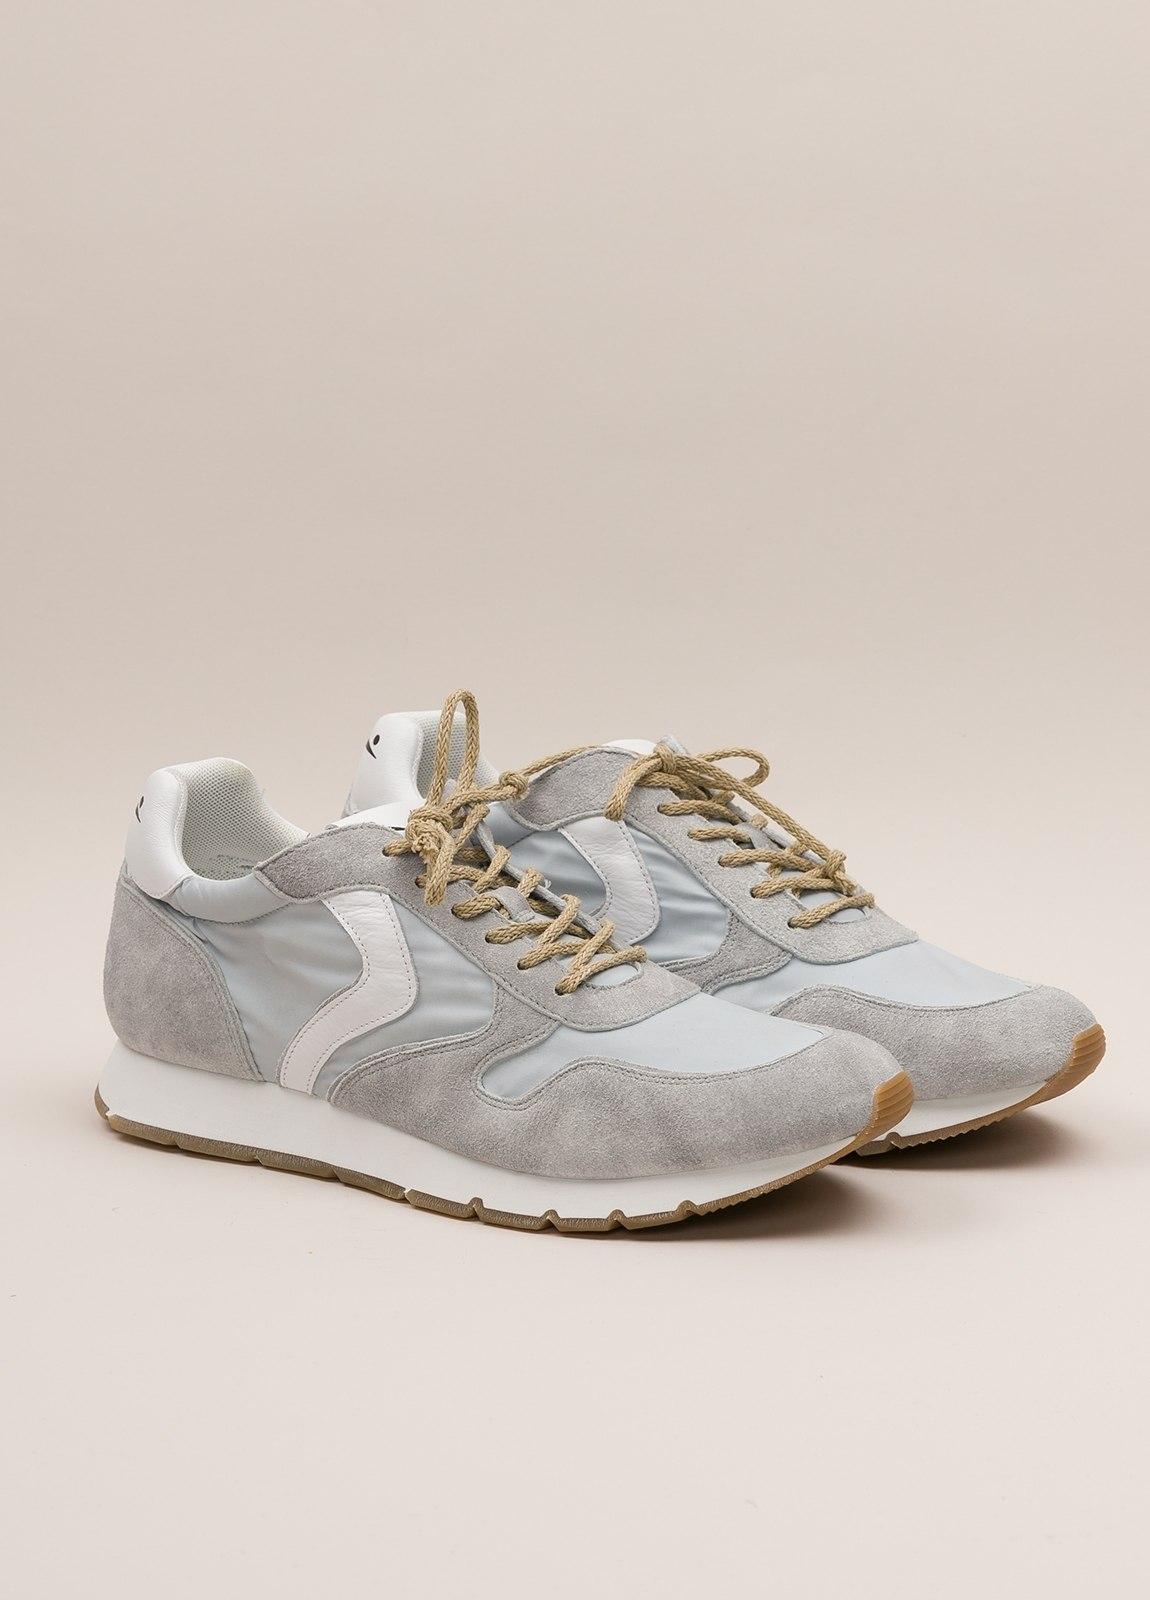 Zapatillas casual VOILE BLANCHE gris claro - Ítem1